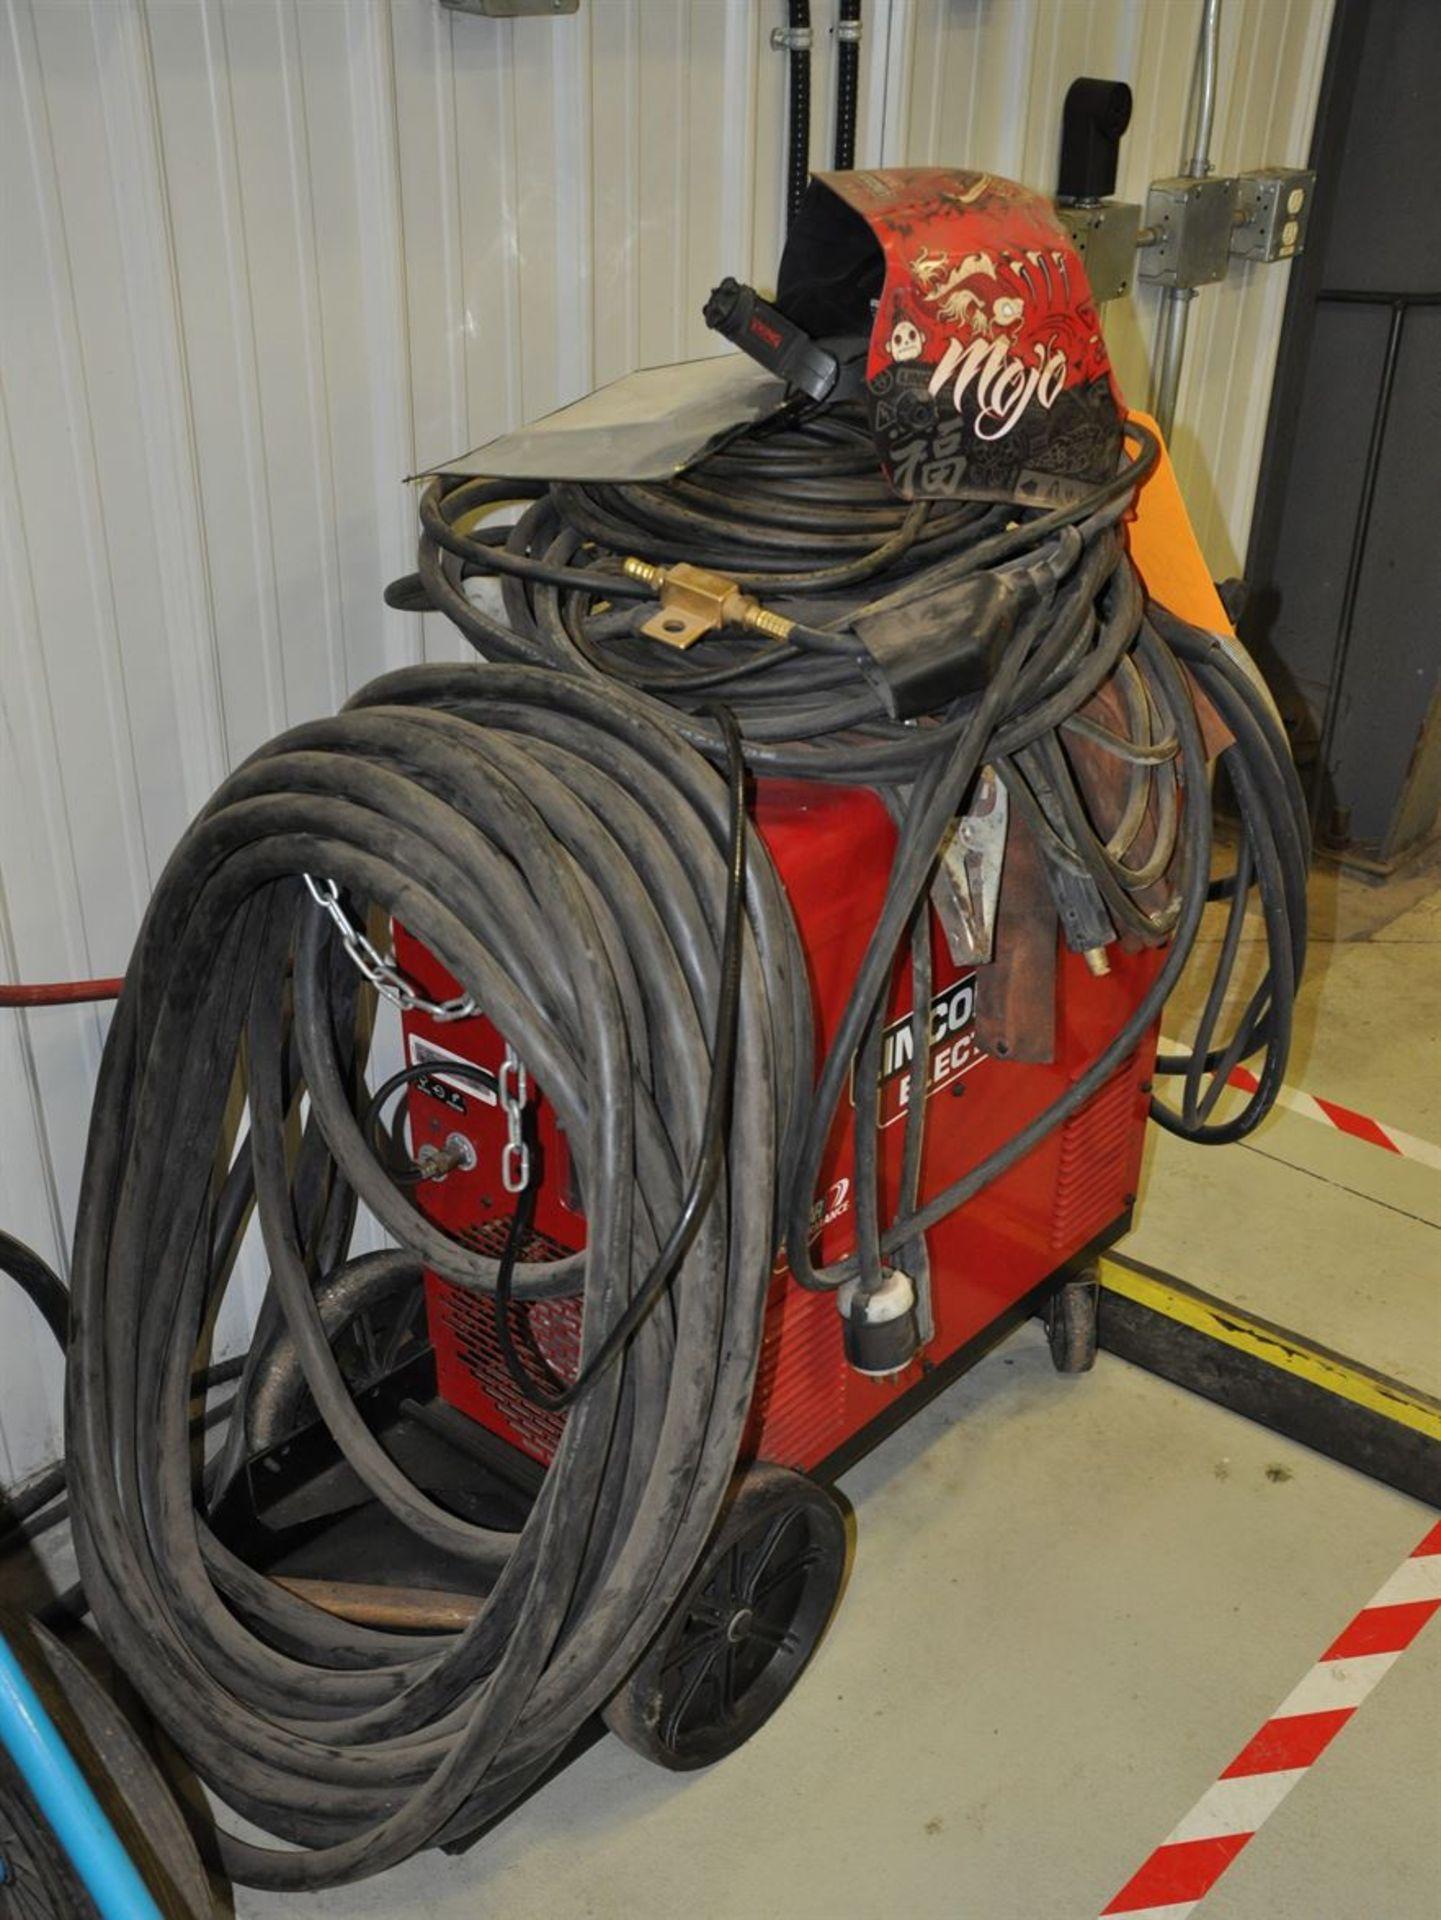 LINCOLN POWER MIG 350MP MIG Welder w/ TIG welding kit and autoshade helmet. - Image 2 of 2